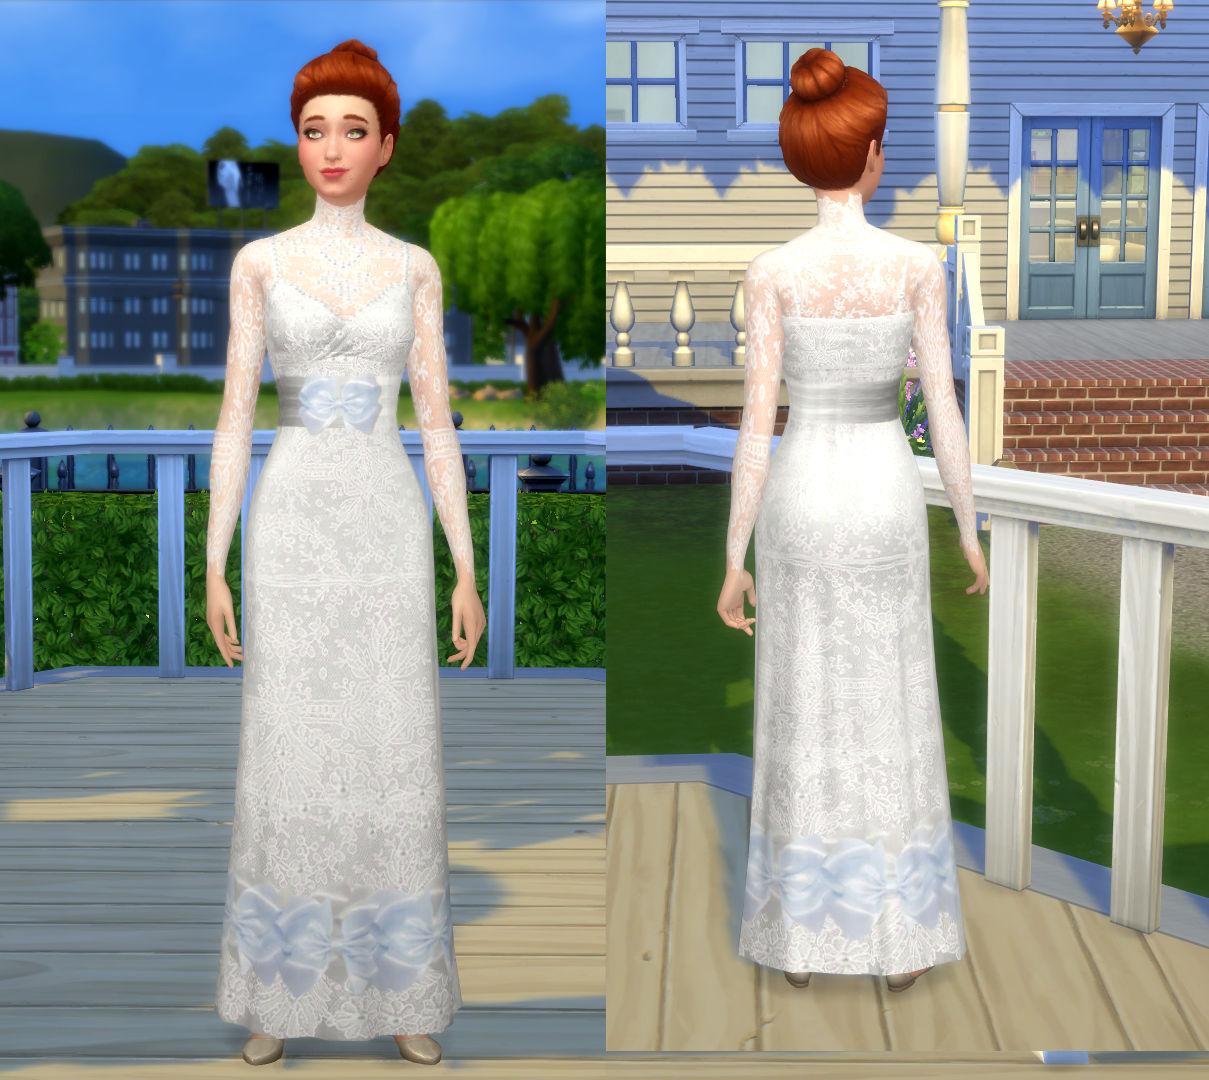 Mod The Sims   Isabella's Wedding Dress